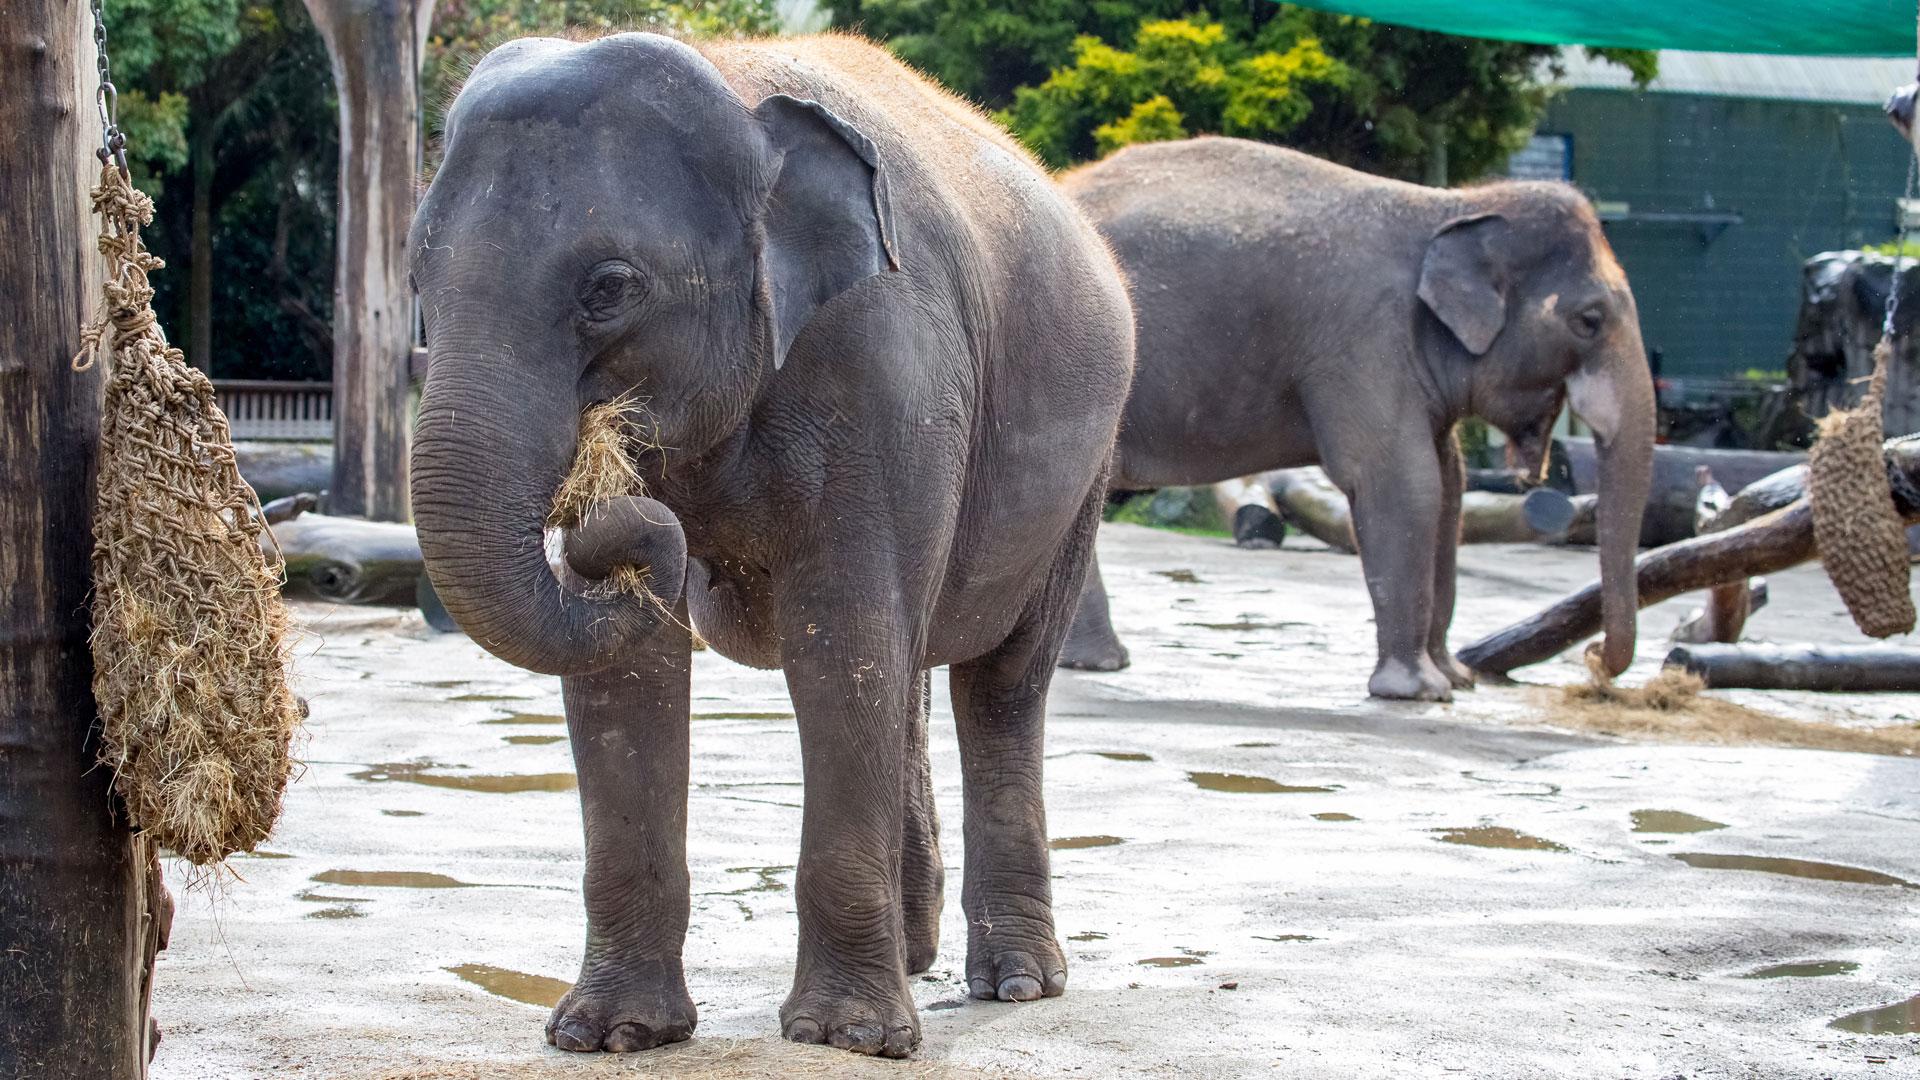 https://rfacdn.nz/zoo/assets/media/elephant-news-gallery-14.jpg